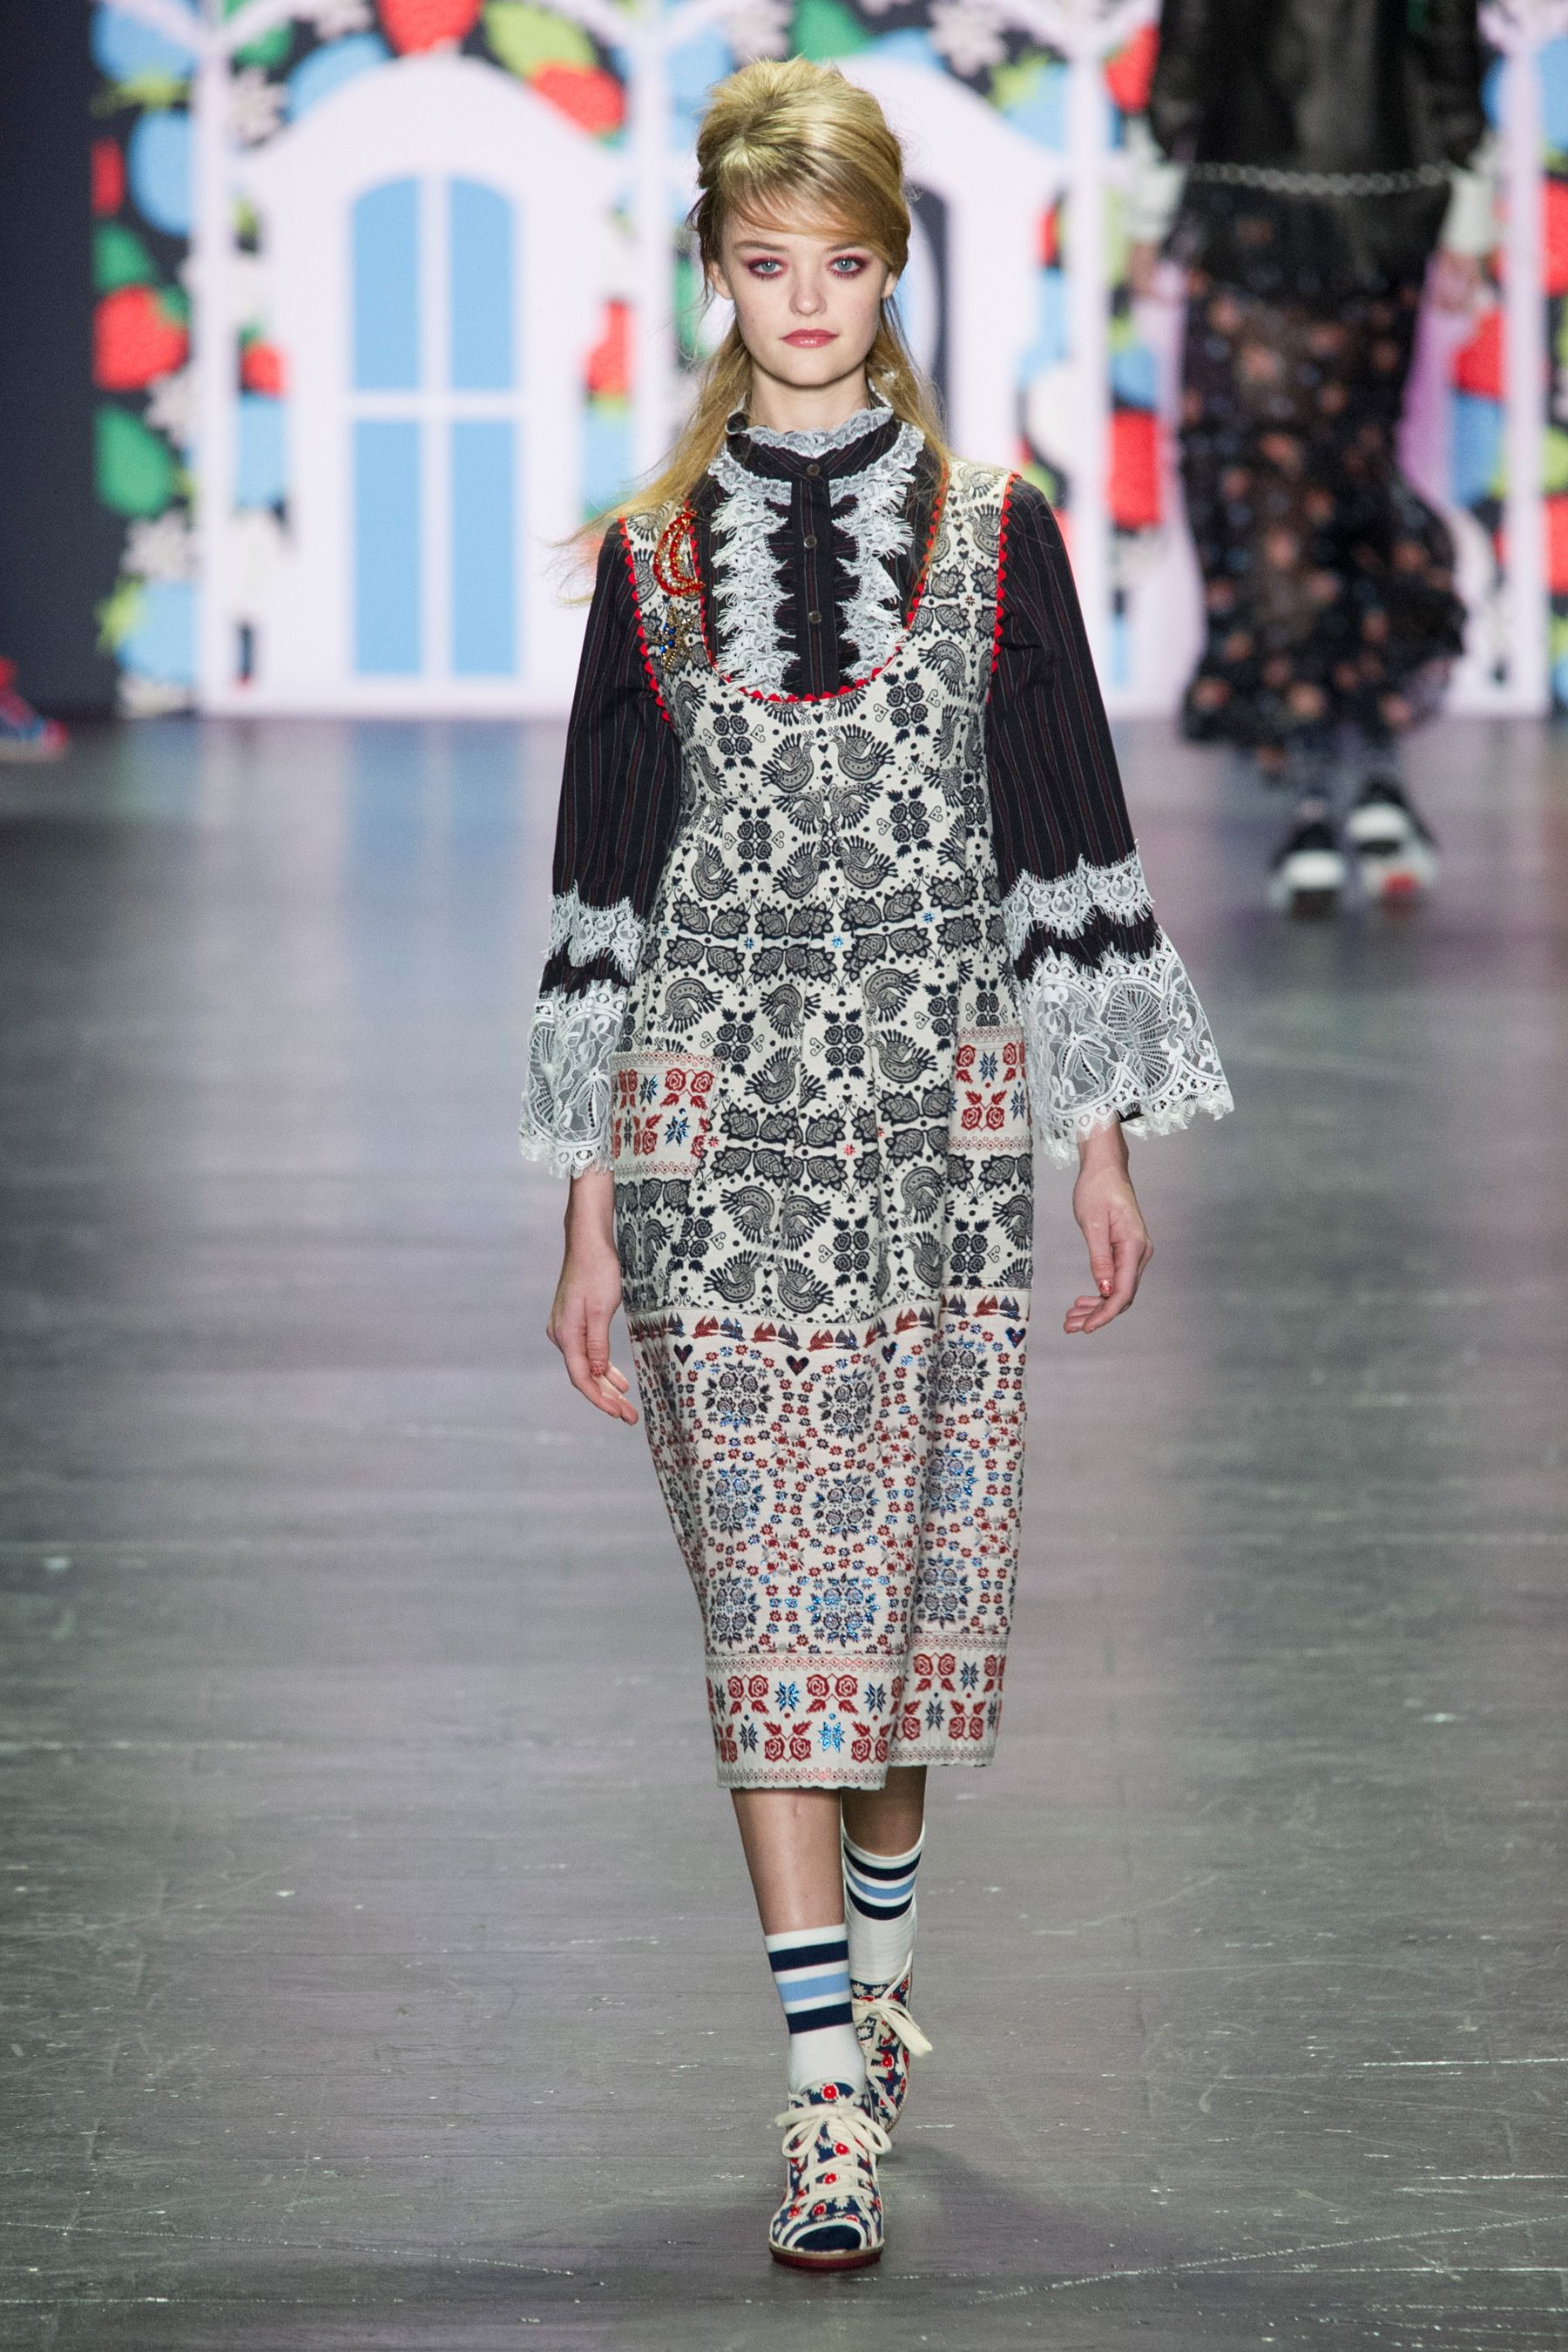 Anna Sui spring/summer 2017, New York Fashion Week